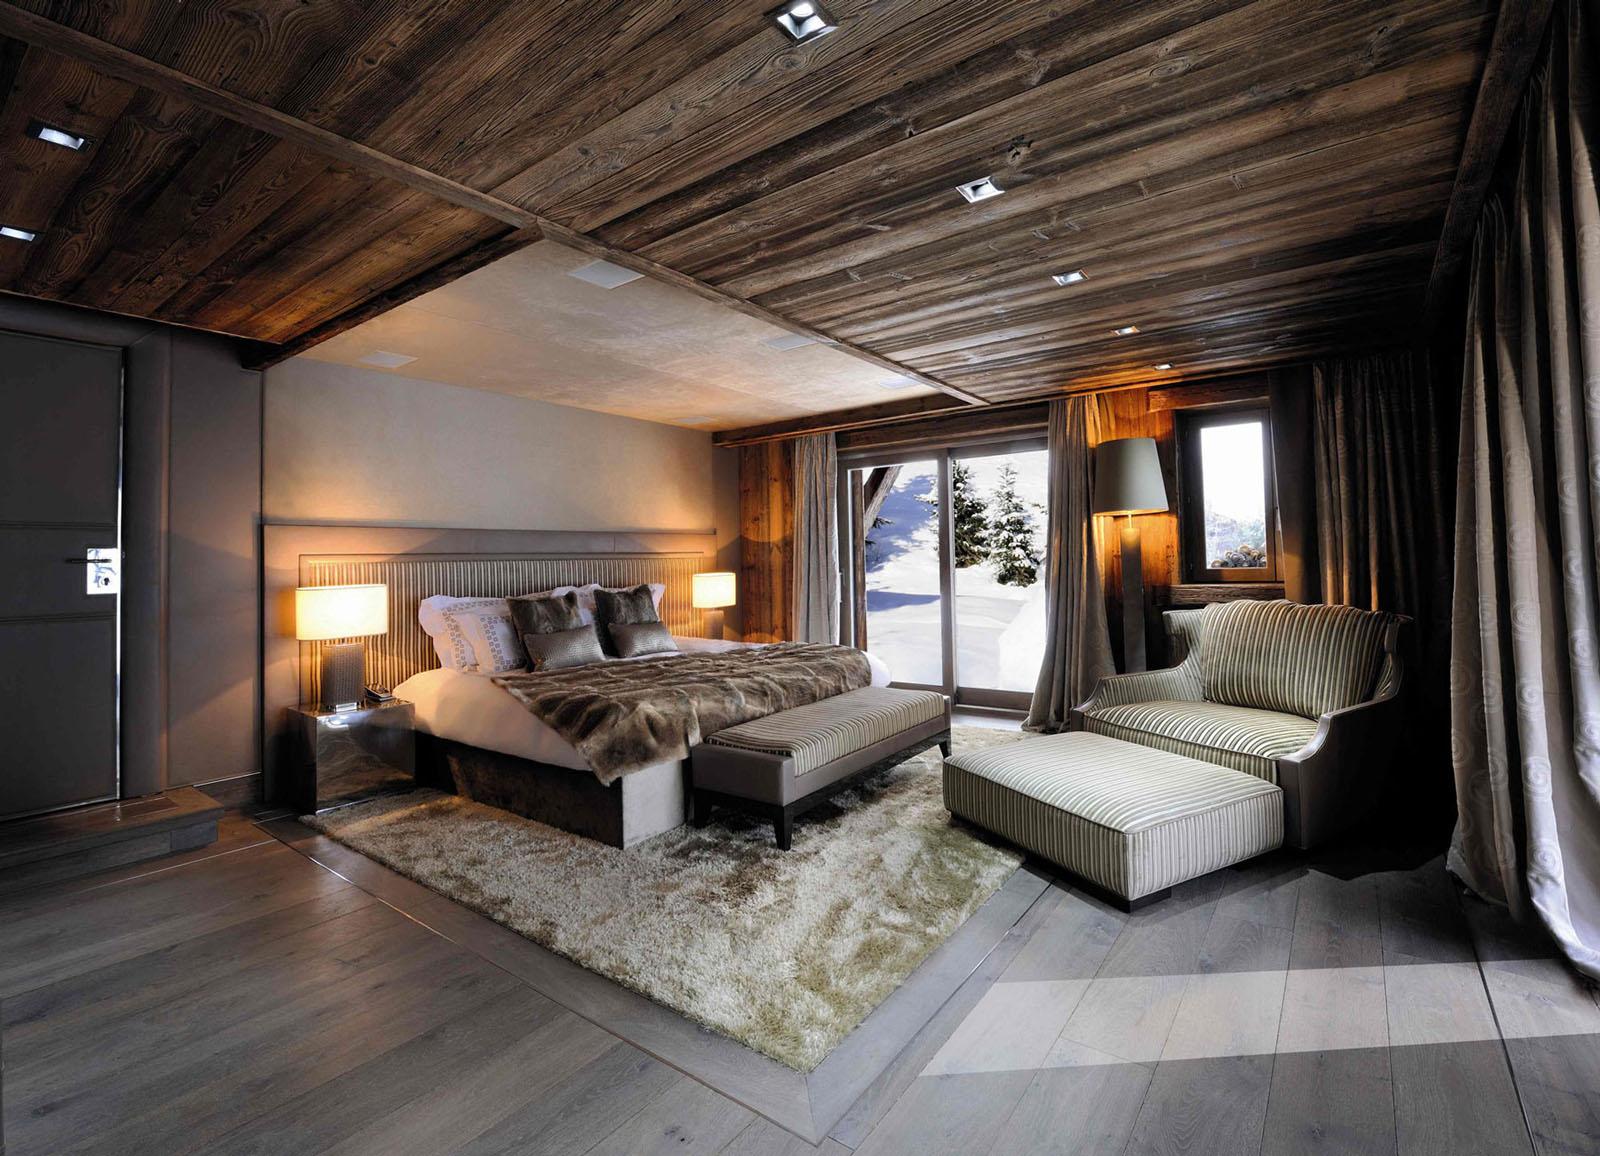 Chic Modern Rustic Chalet In The Rhne Alpes IDesignArch Interior Design Architecture